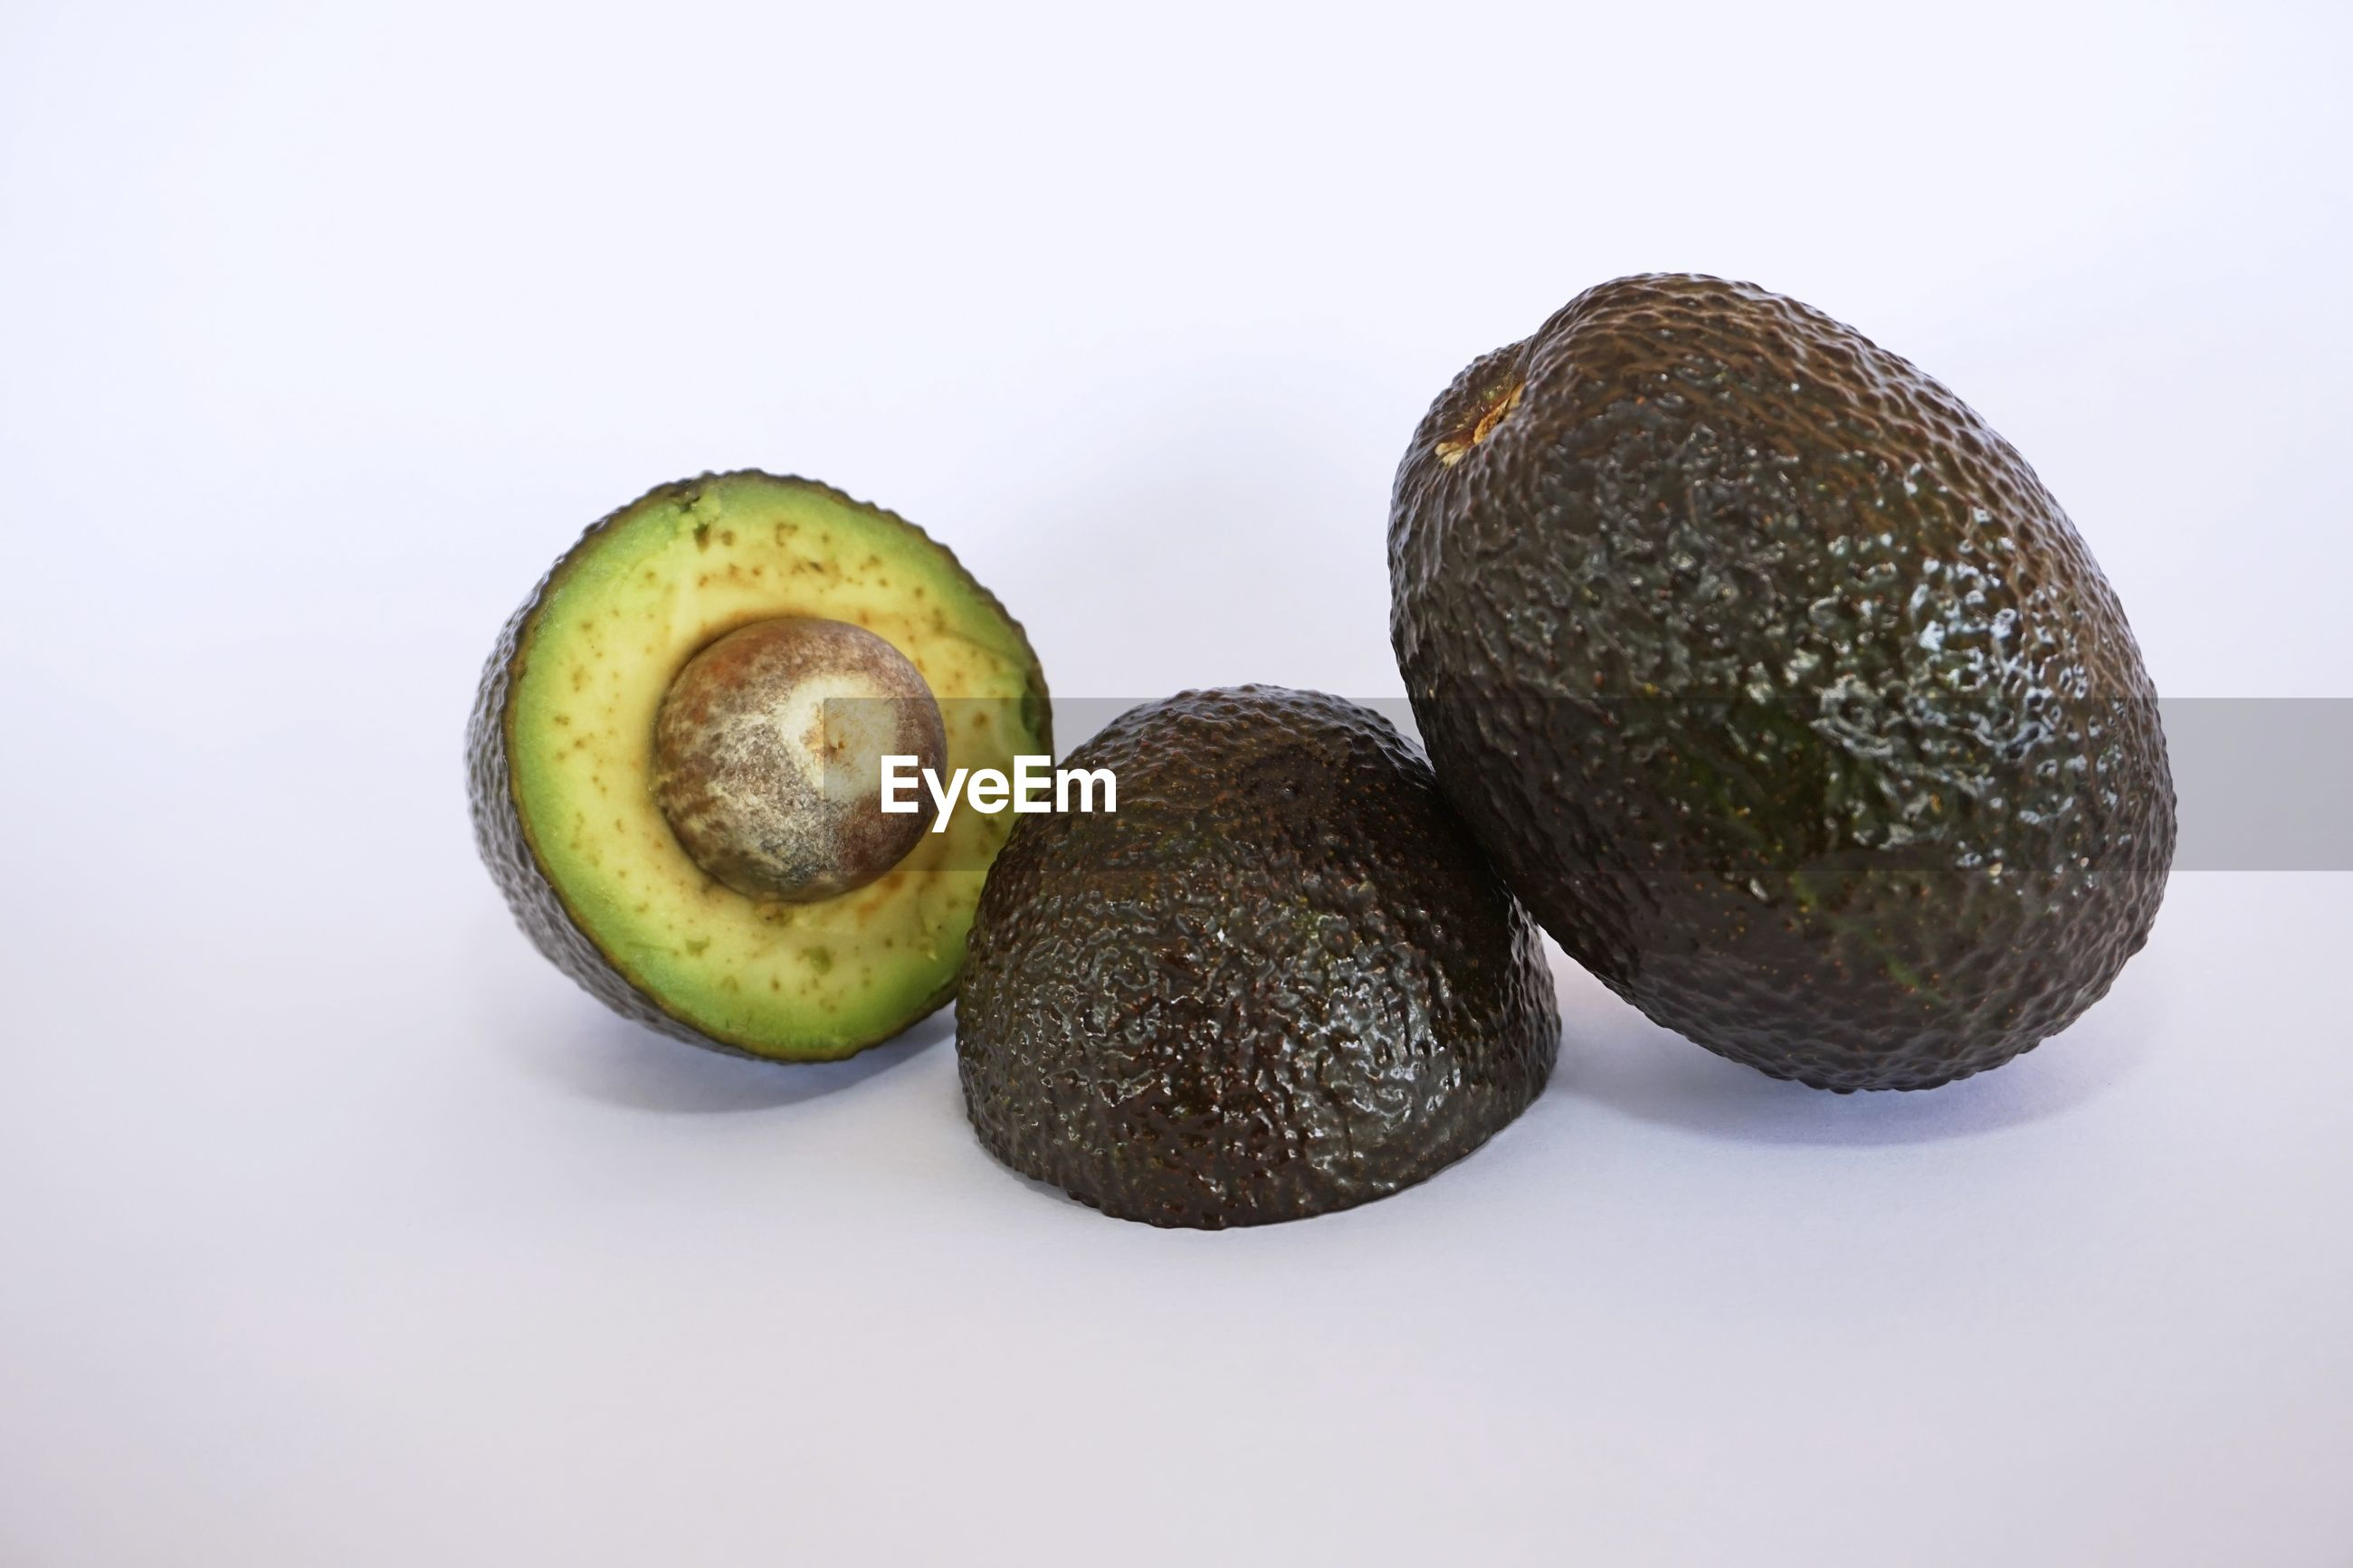 Close-up of avocado fruits against white background